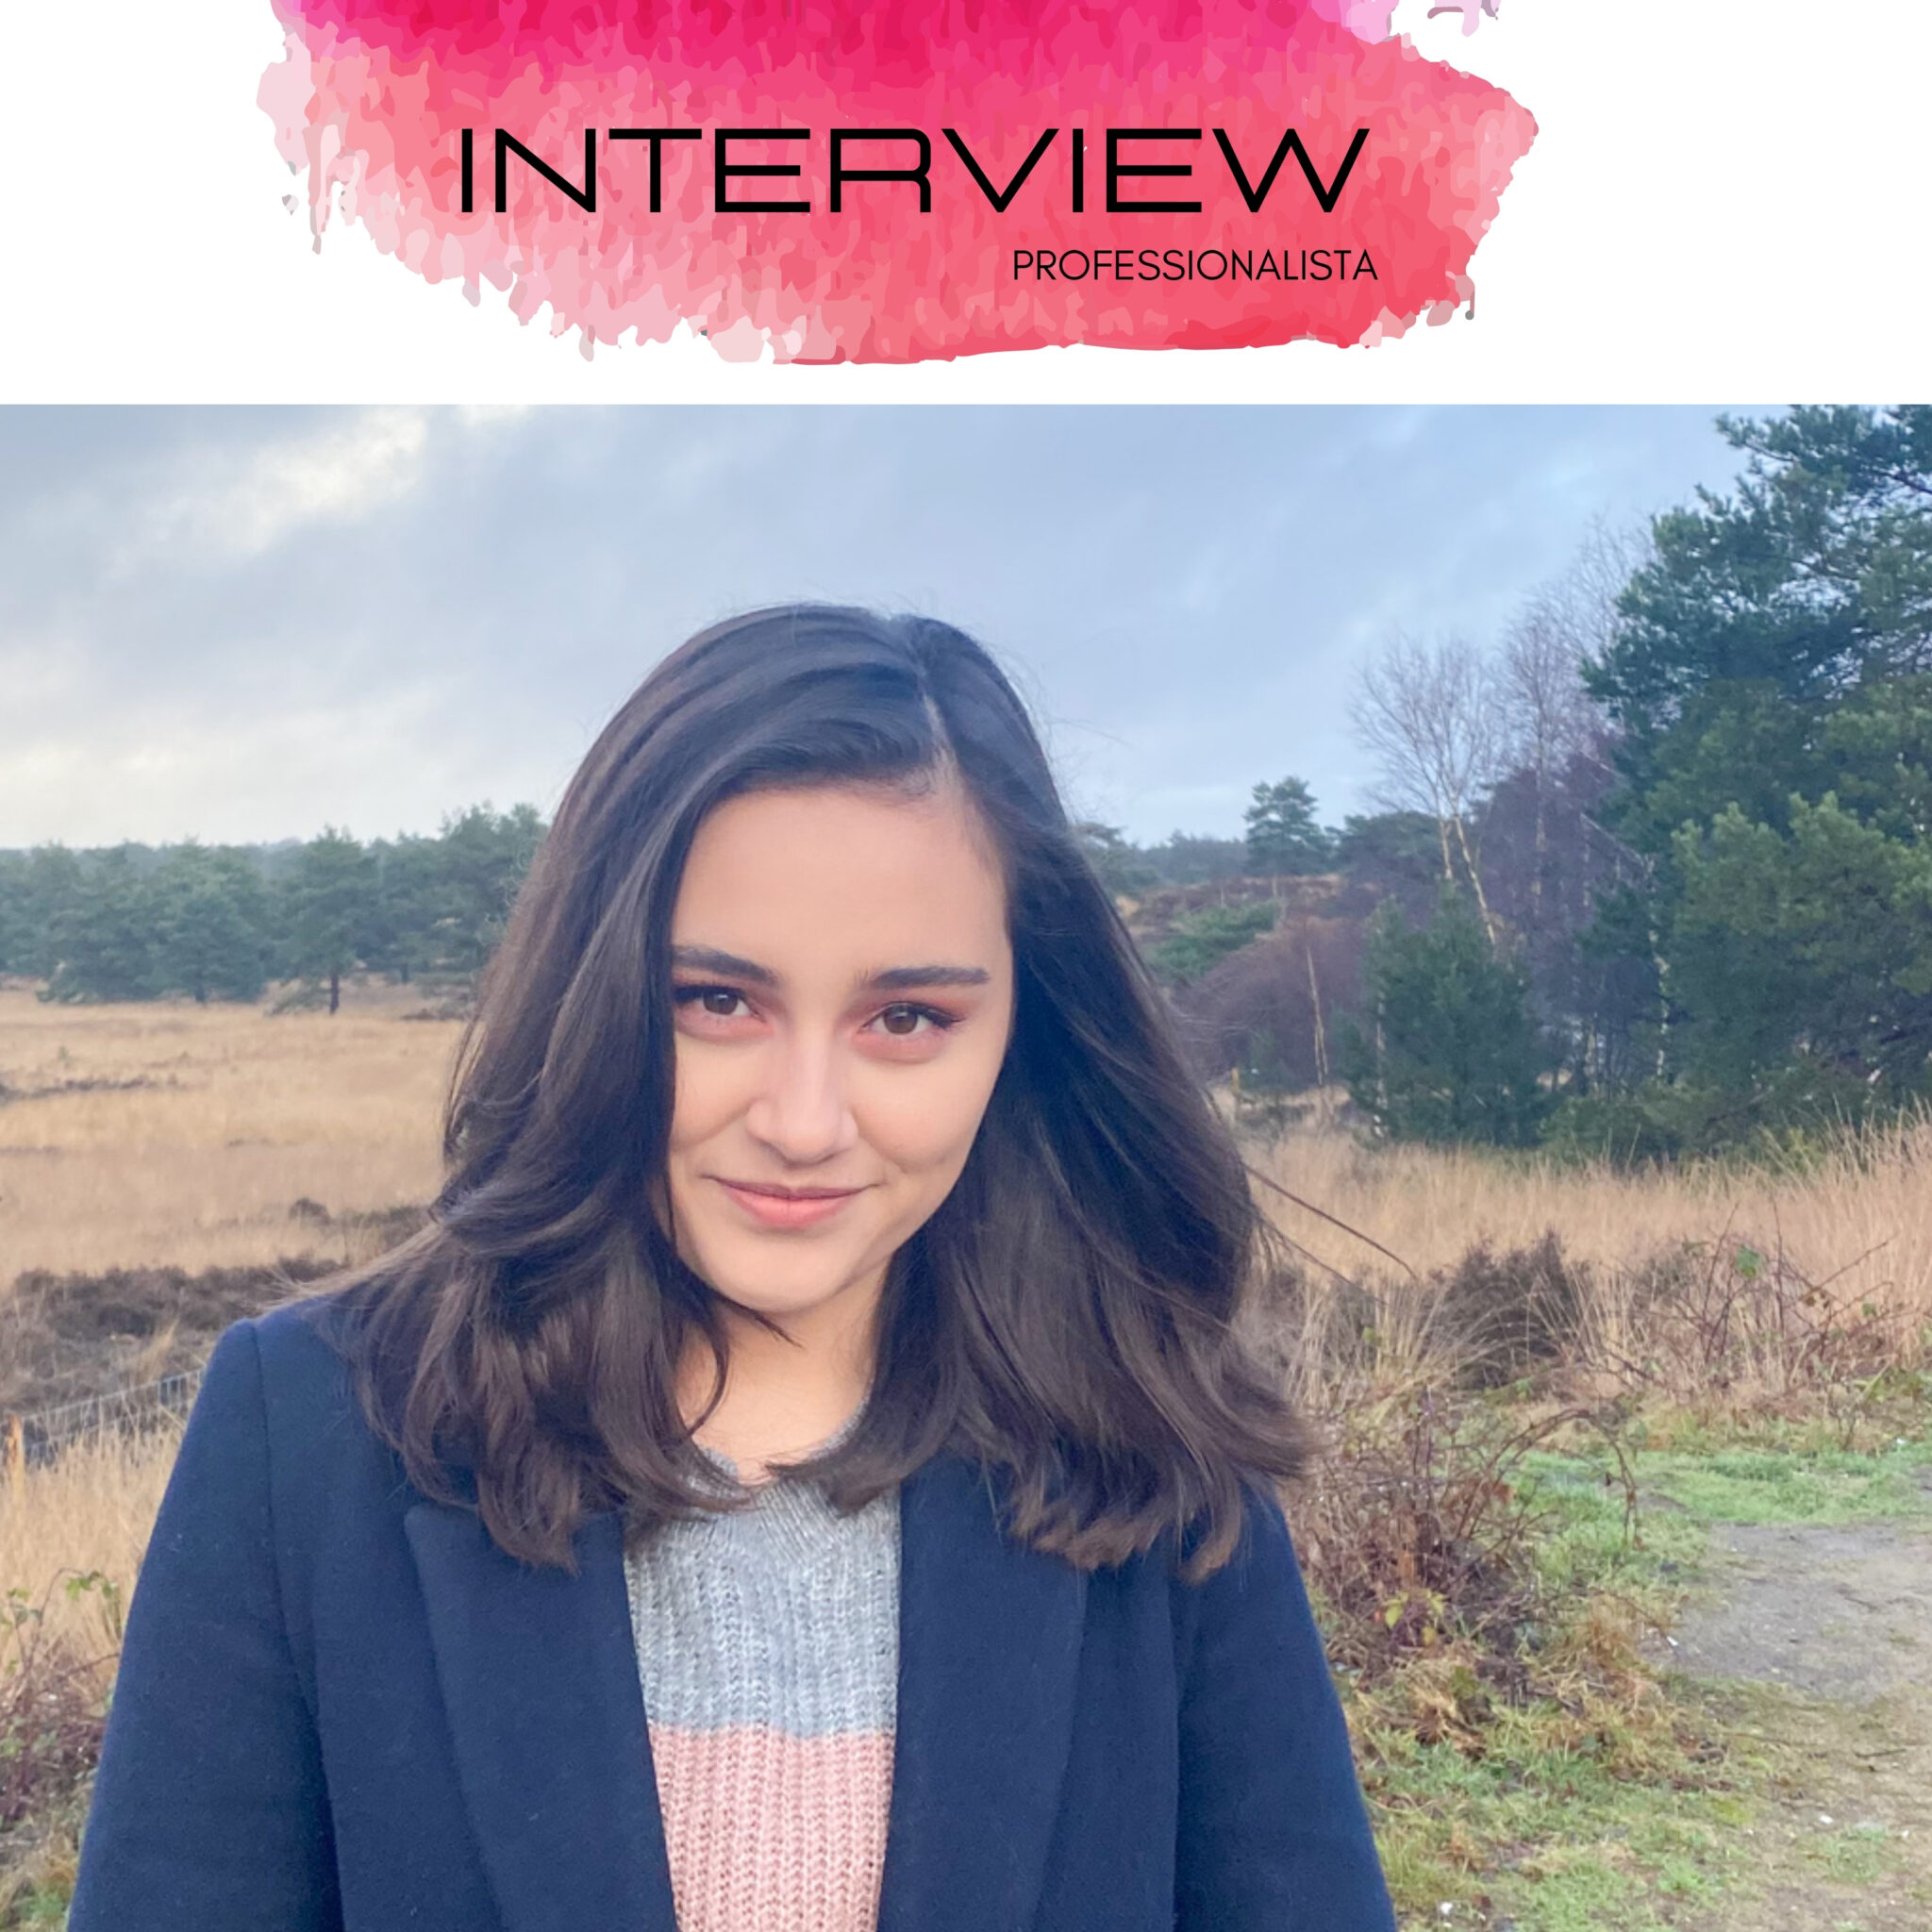 Interview Professionalista Fee Harmze